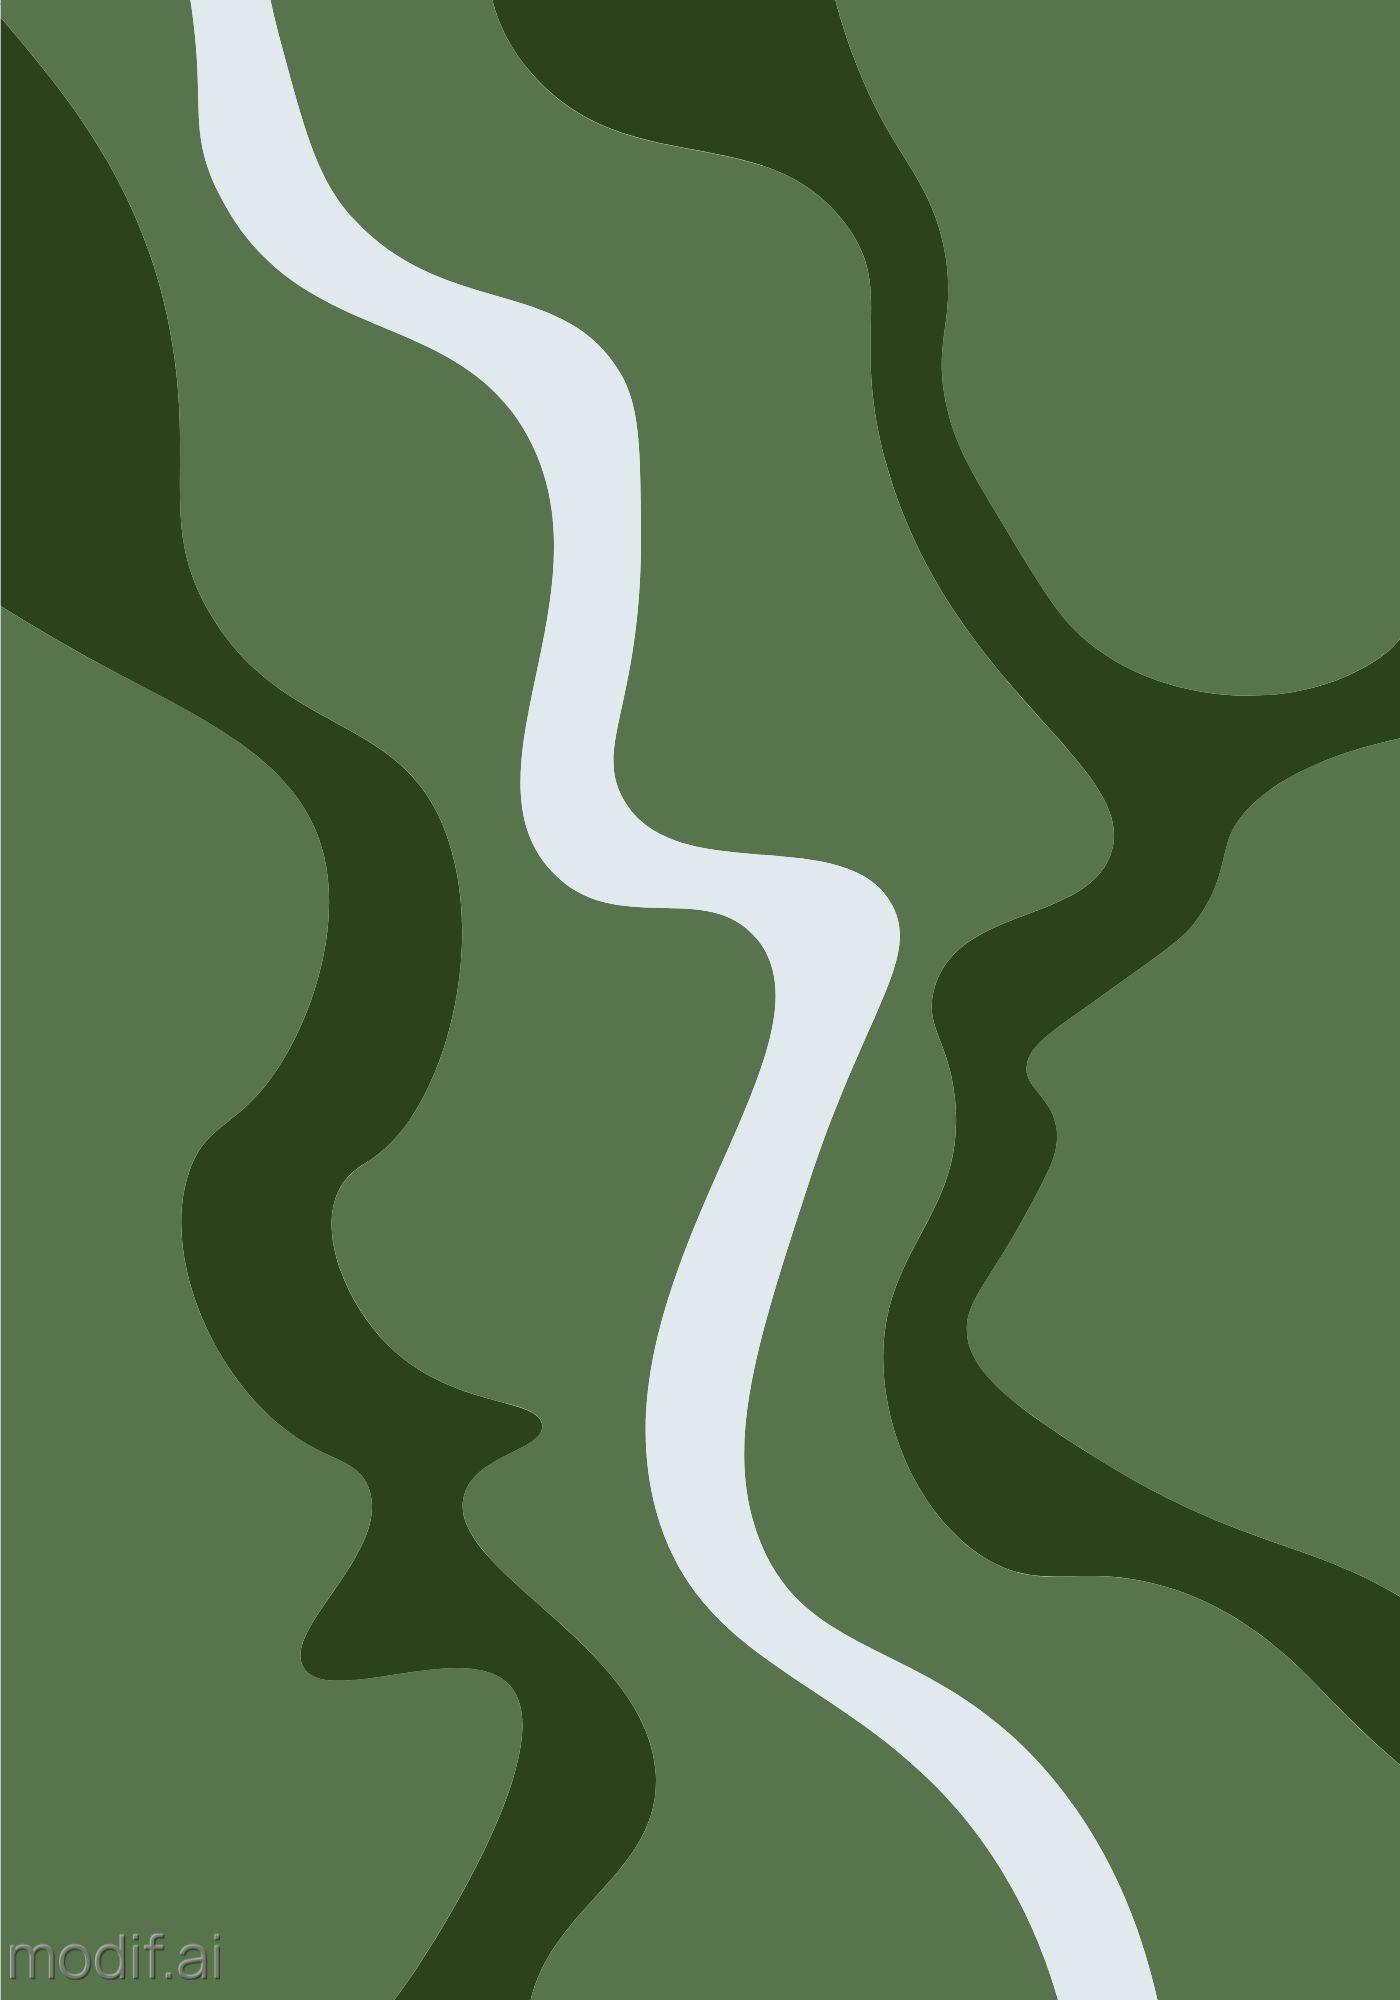 Minimal River Art Wall Poster Template